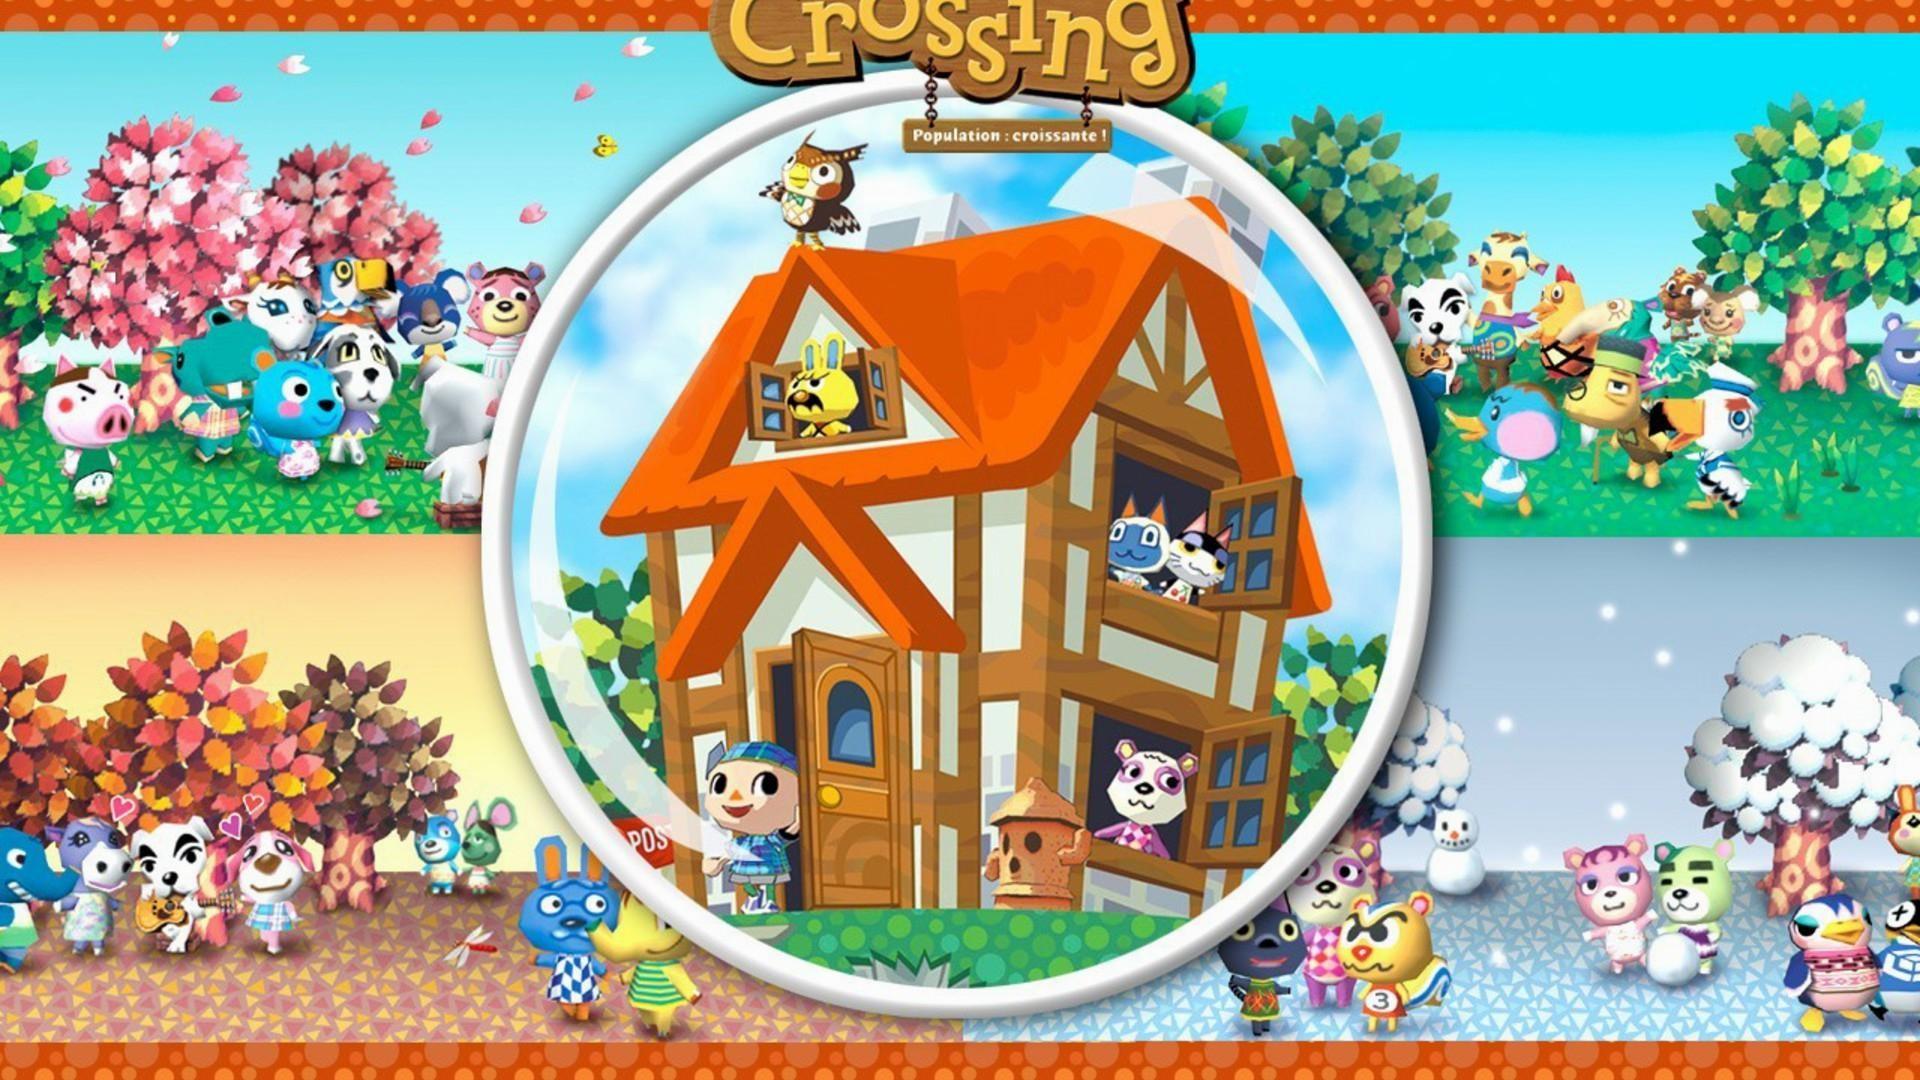 wallpaper.wiki-Desktop-Animal-Crossing-Images-PIC-WPE0012457